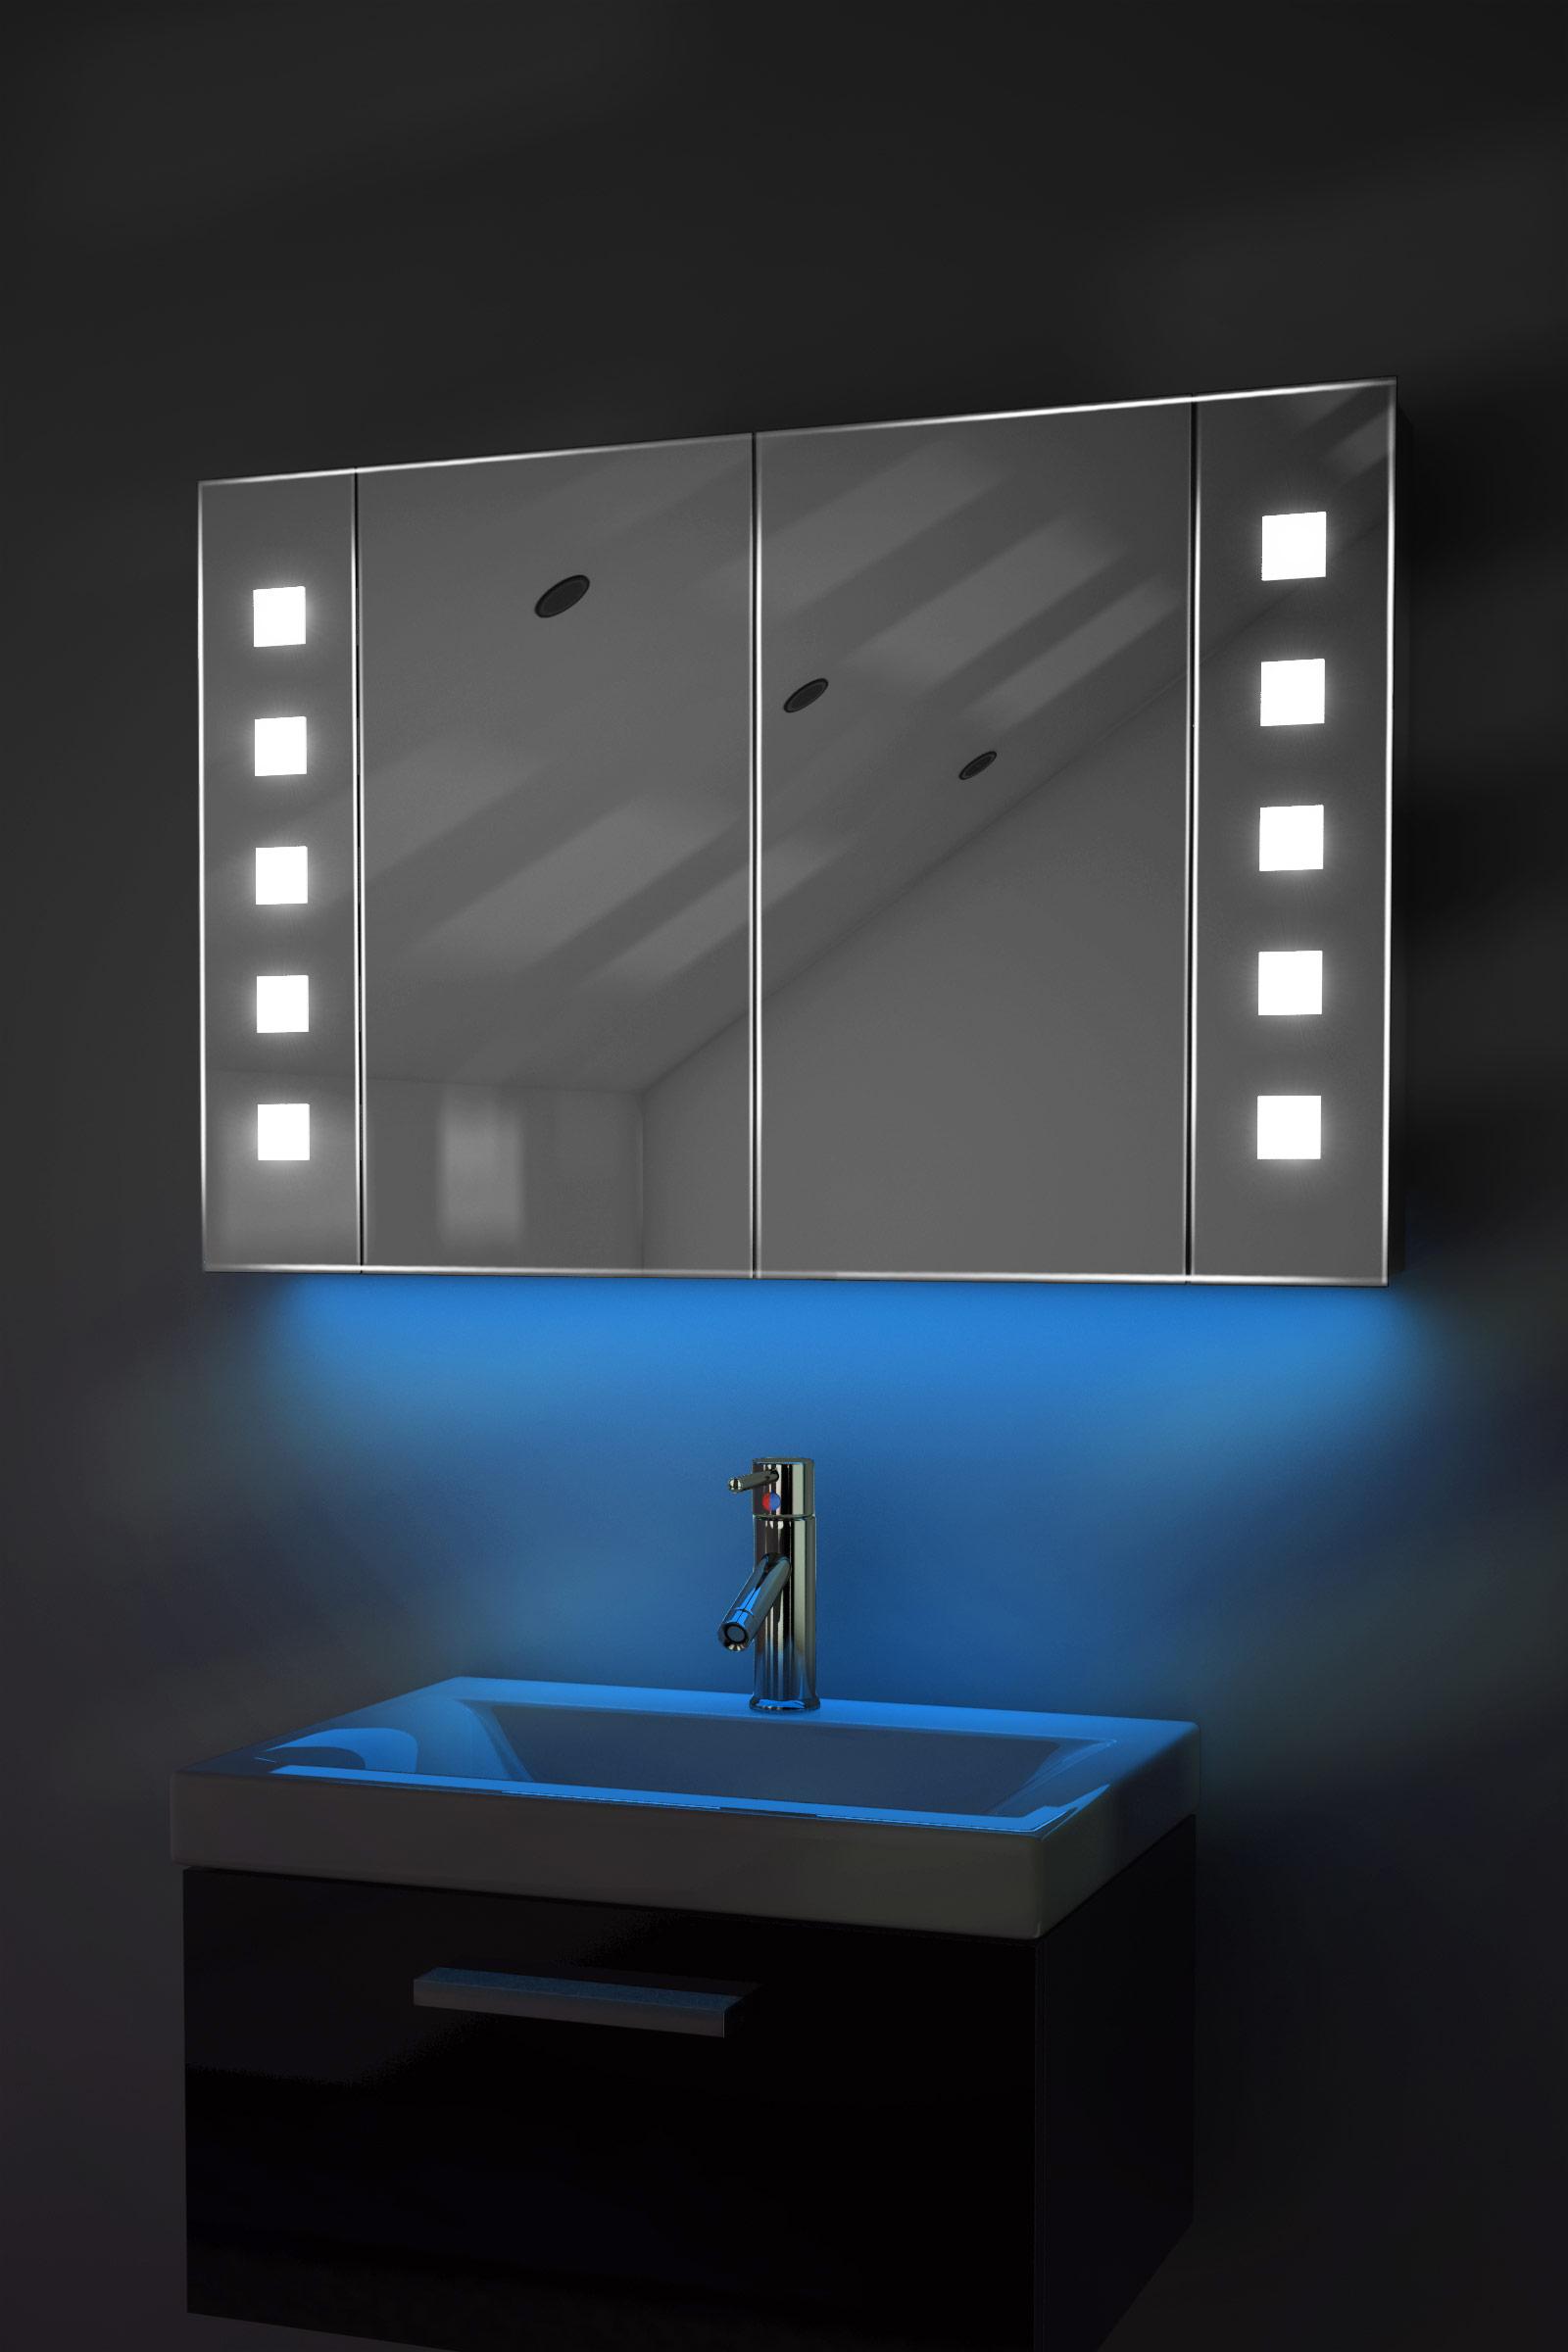 audio schrank m beschlagschutz bluetooth steckdose sensor k74baud ebay. Black Bedroom Furniture Sets. Home Design Ideas